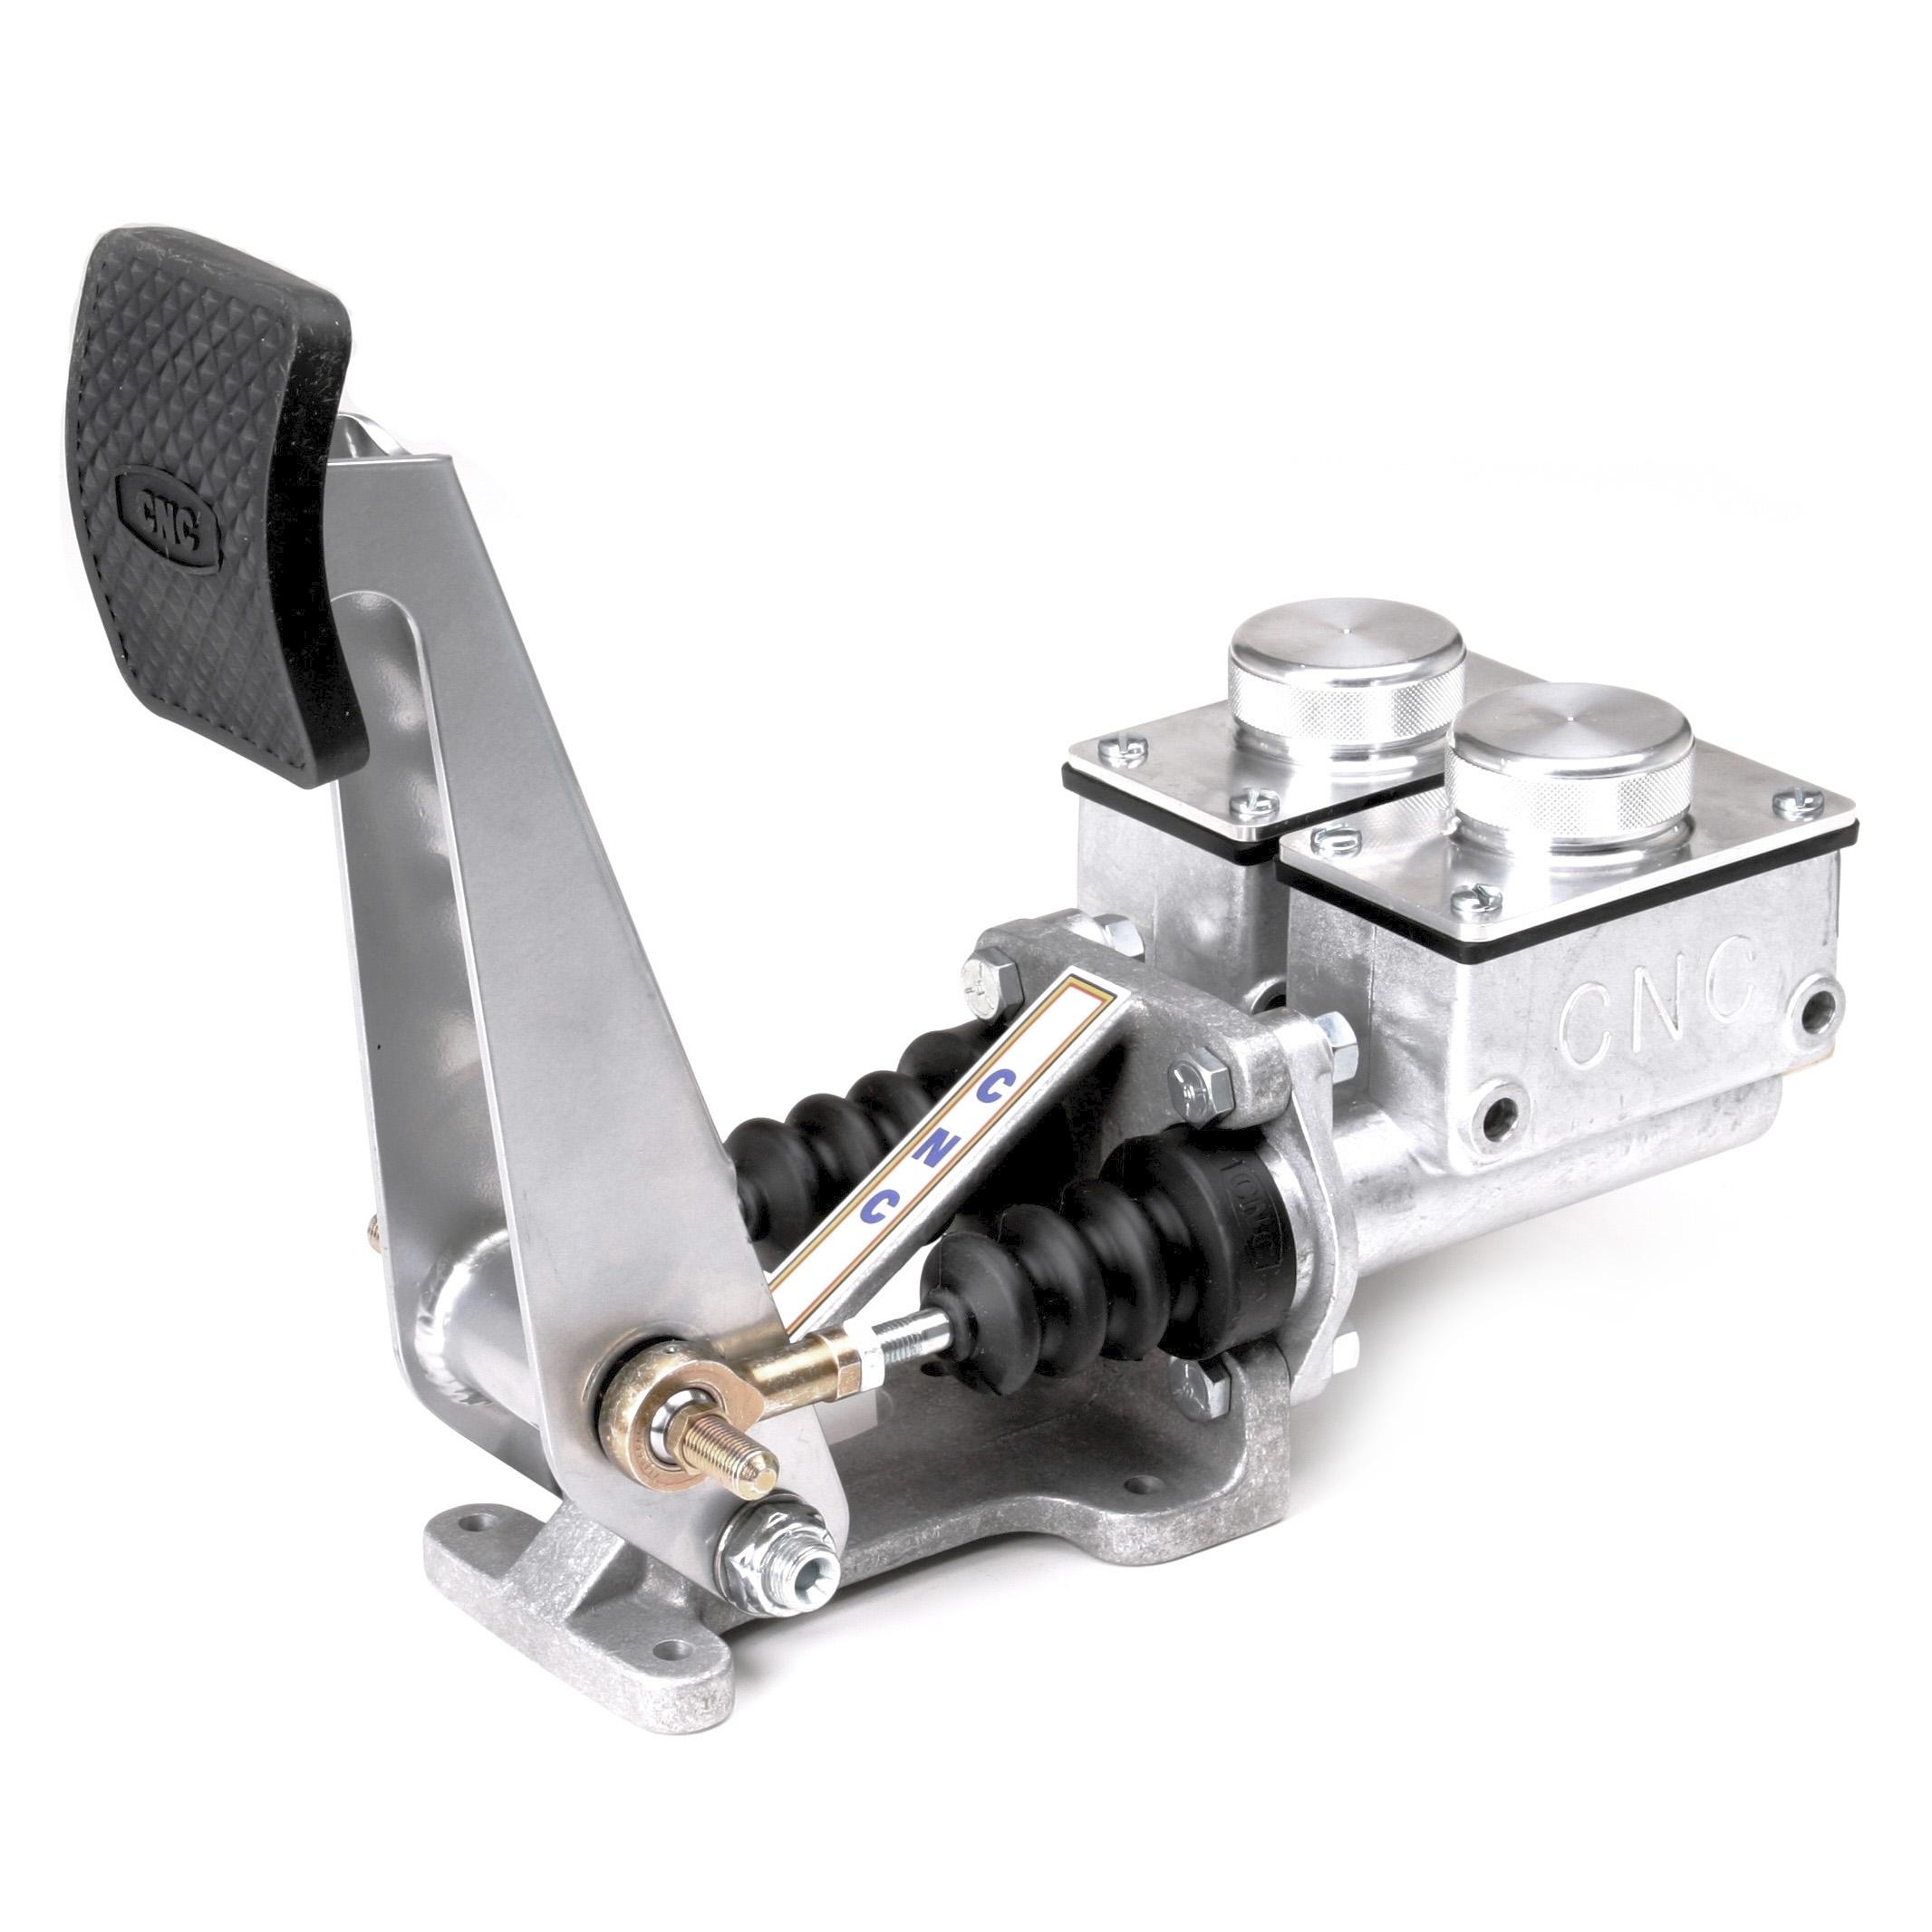 CNC Brake Pedals